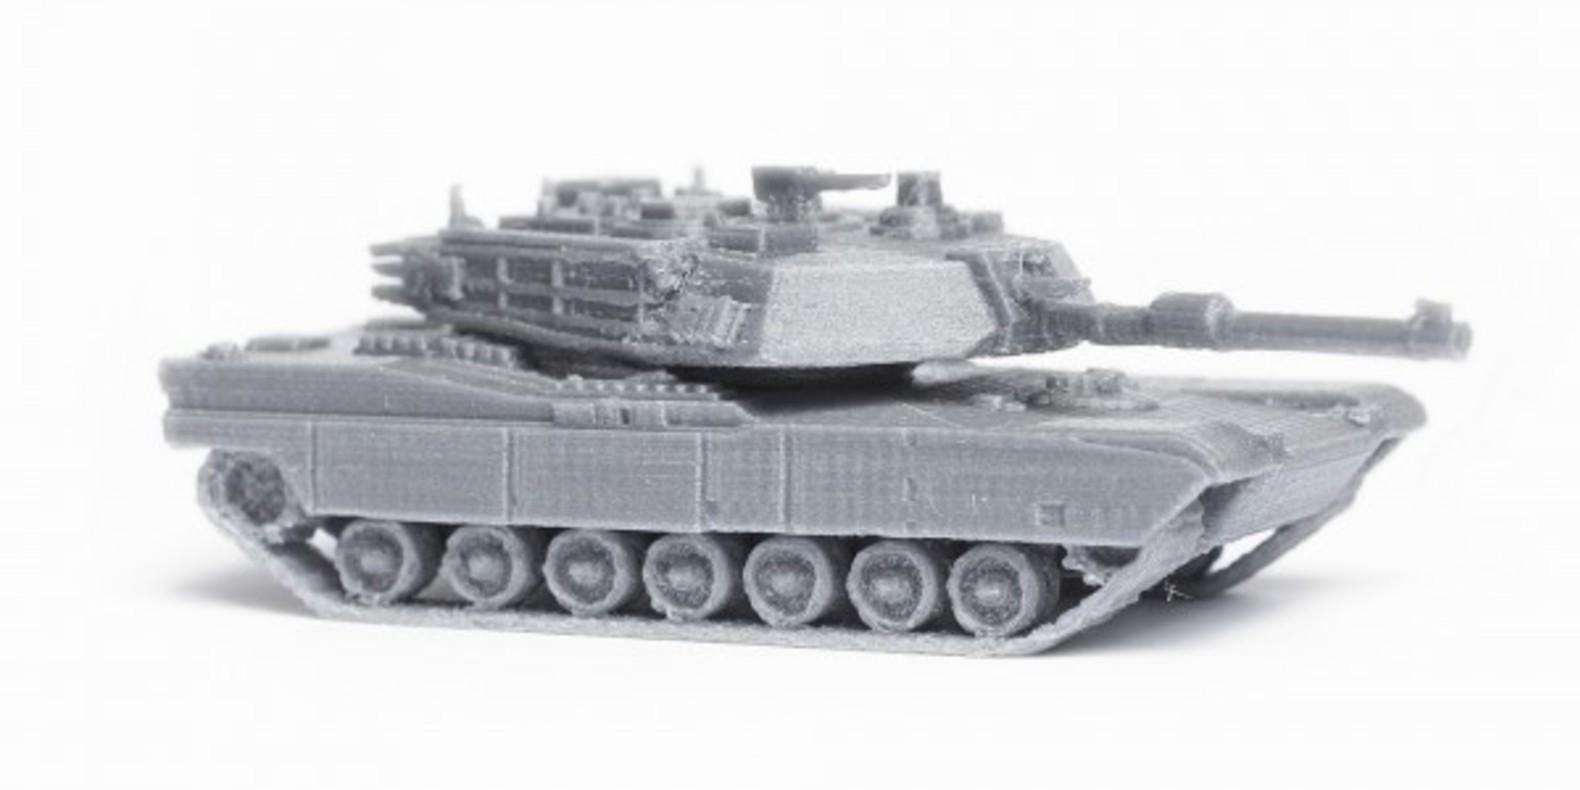 tanks-duc-tran-formbyte-fichier-3d-stl-gratuit-cults-2